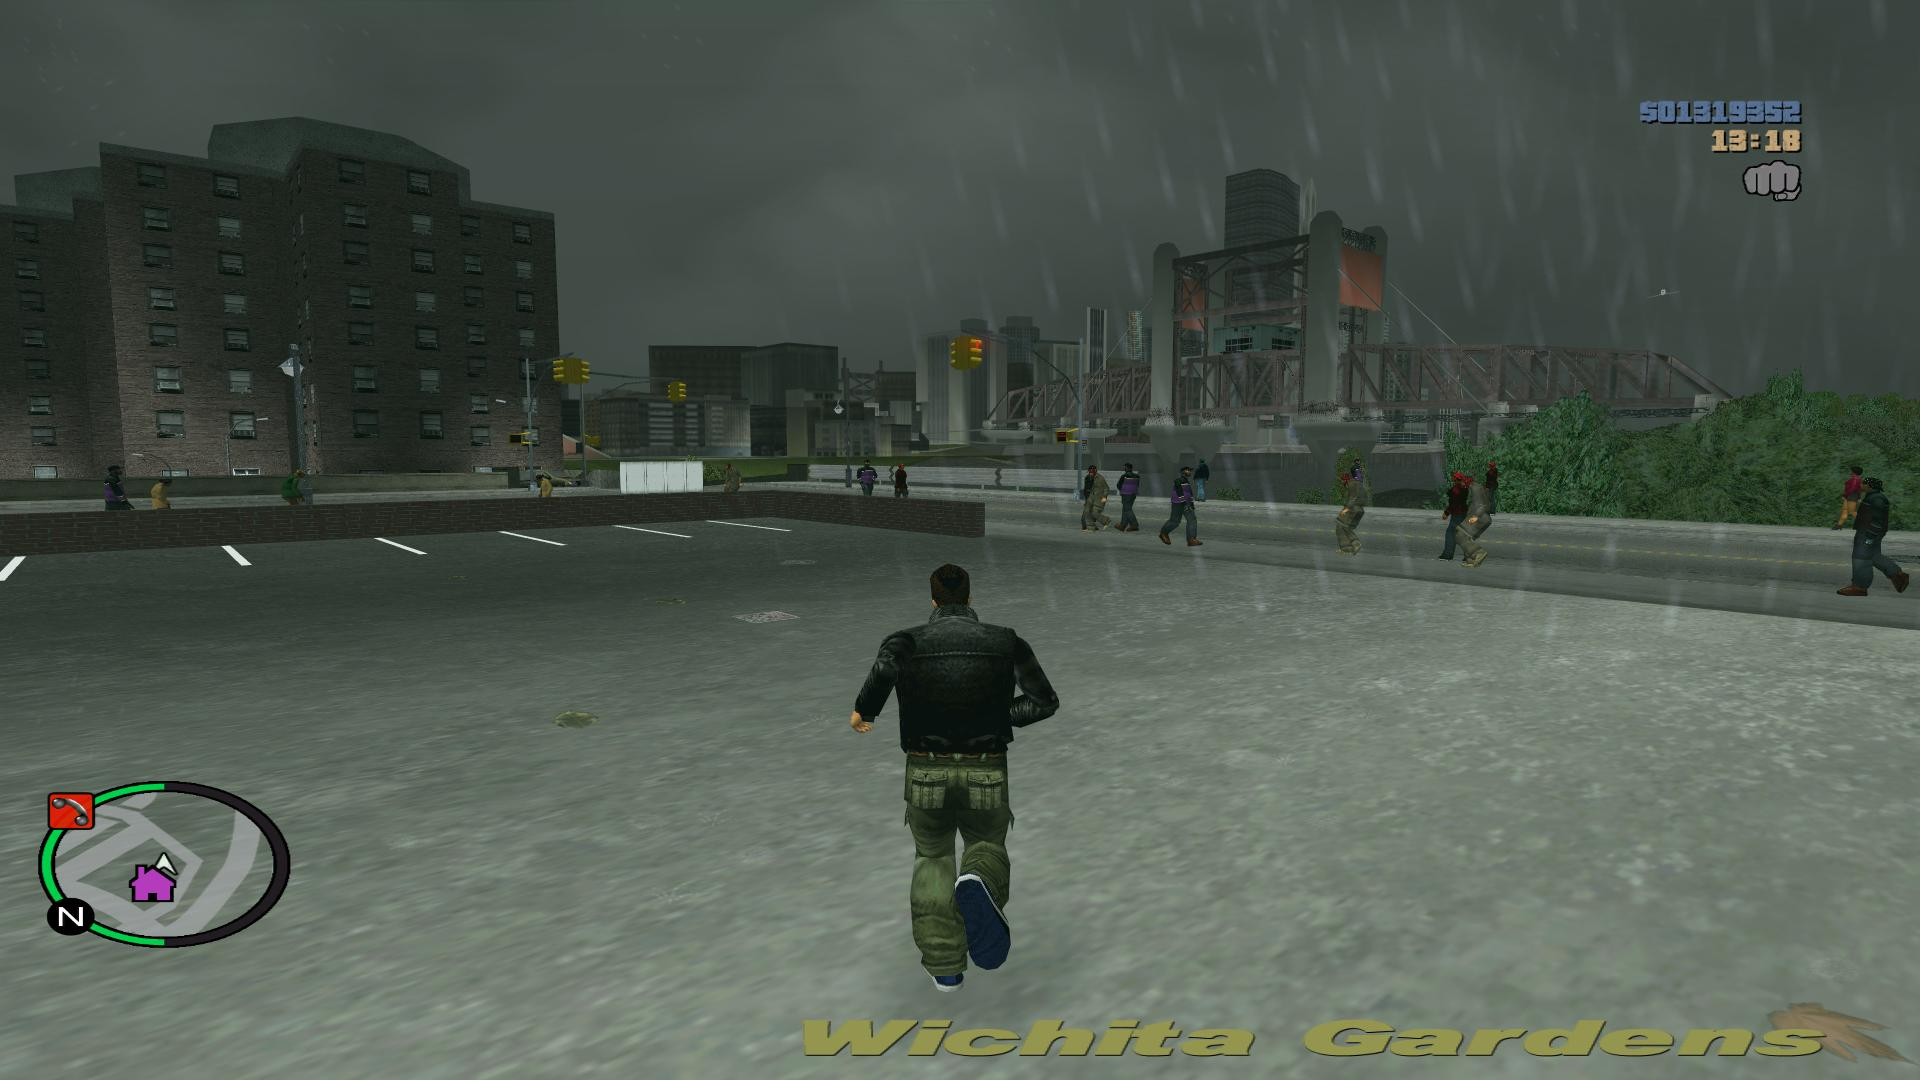 GTAGarage com » IV Hud For GTA III And Vice City » View Screenshot